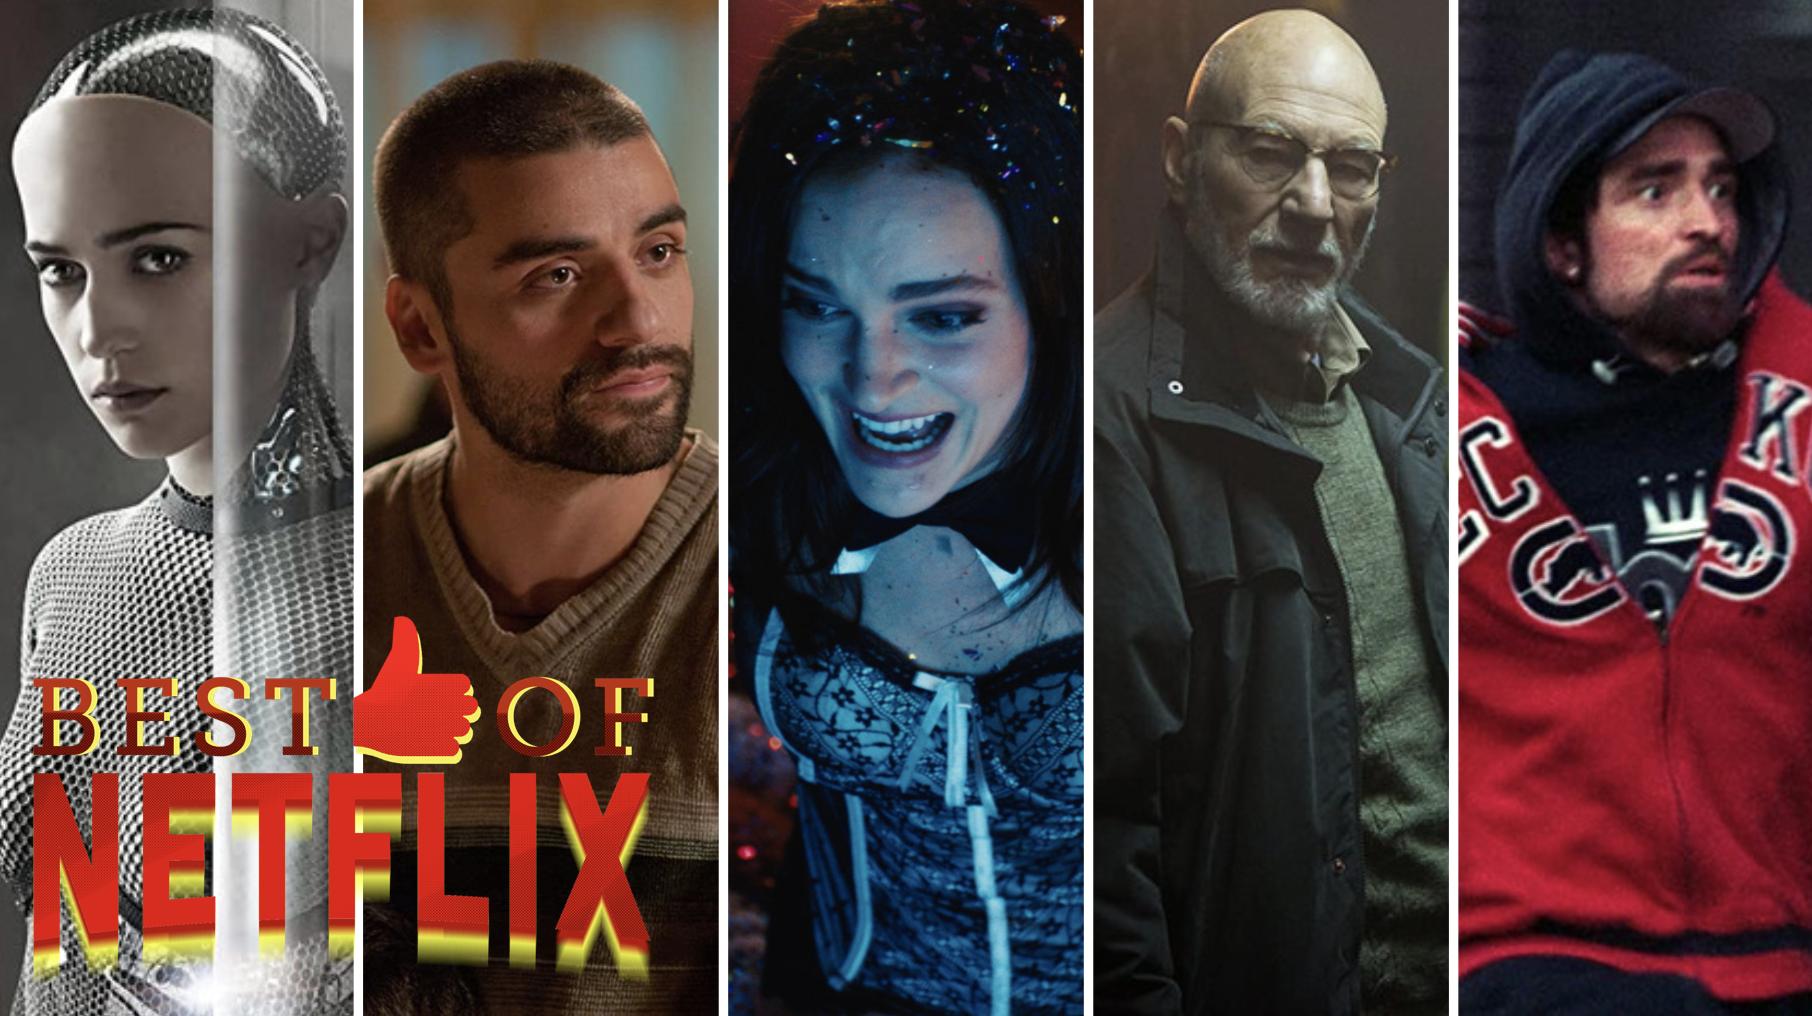 The 10 best thrillers on Netflix